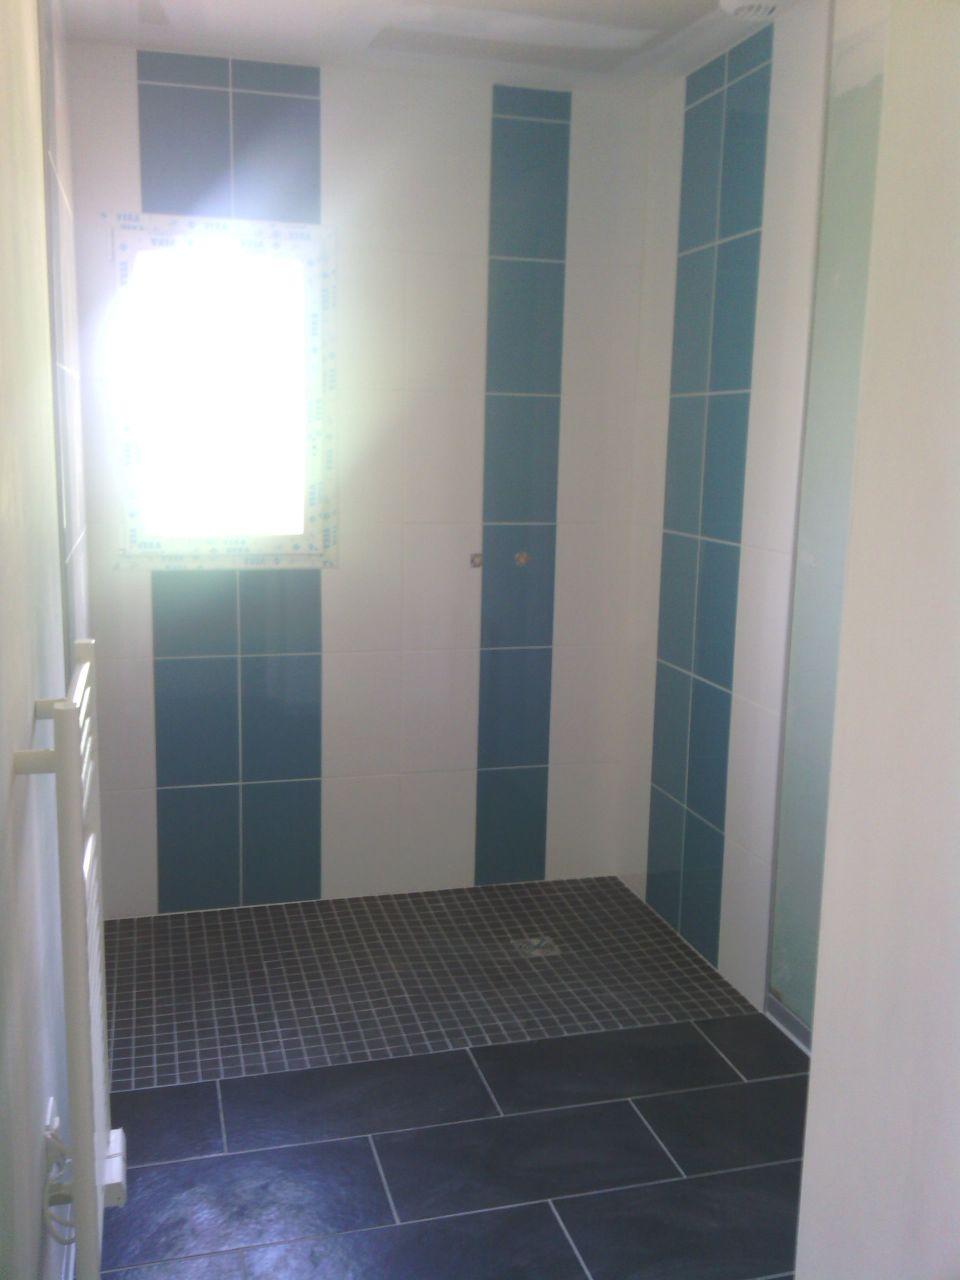 Photo fa ence de la douche l 39 italienne termin e ainsi for Douche italienne faience